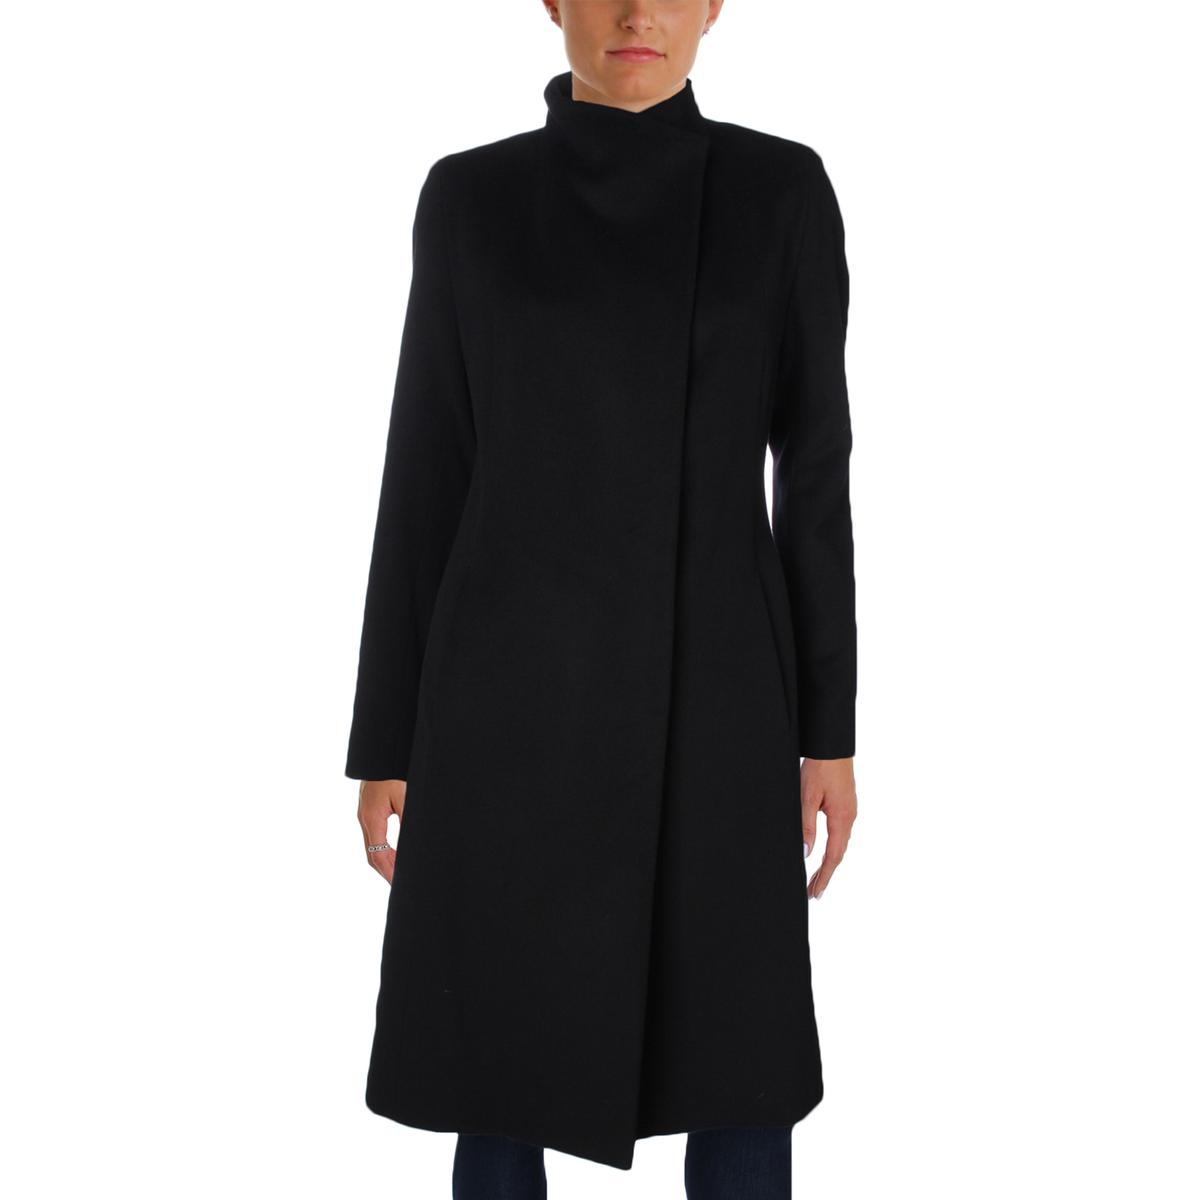 Cinzia Rocca Womens Wool Asymmetrical Neck Pea Coat by Cinzia Rocca